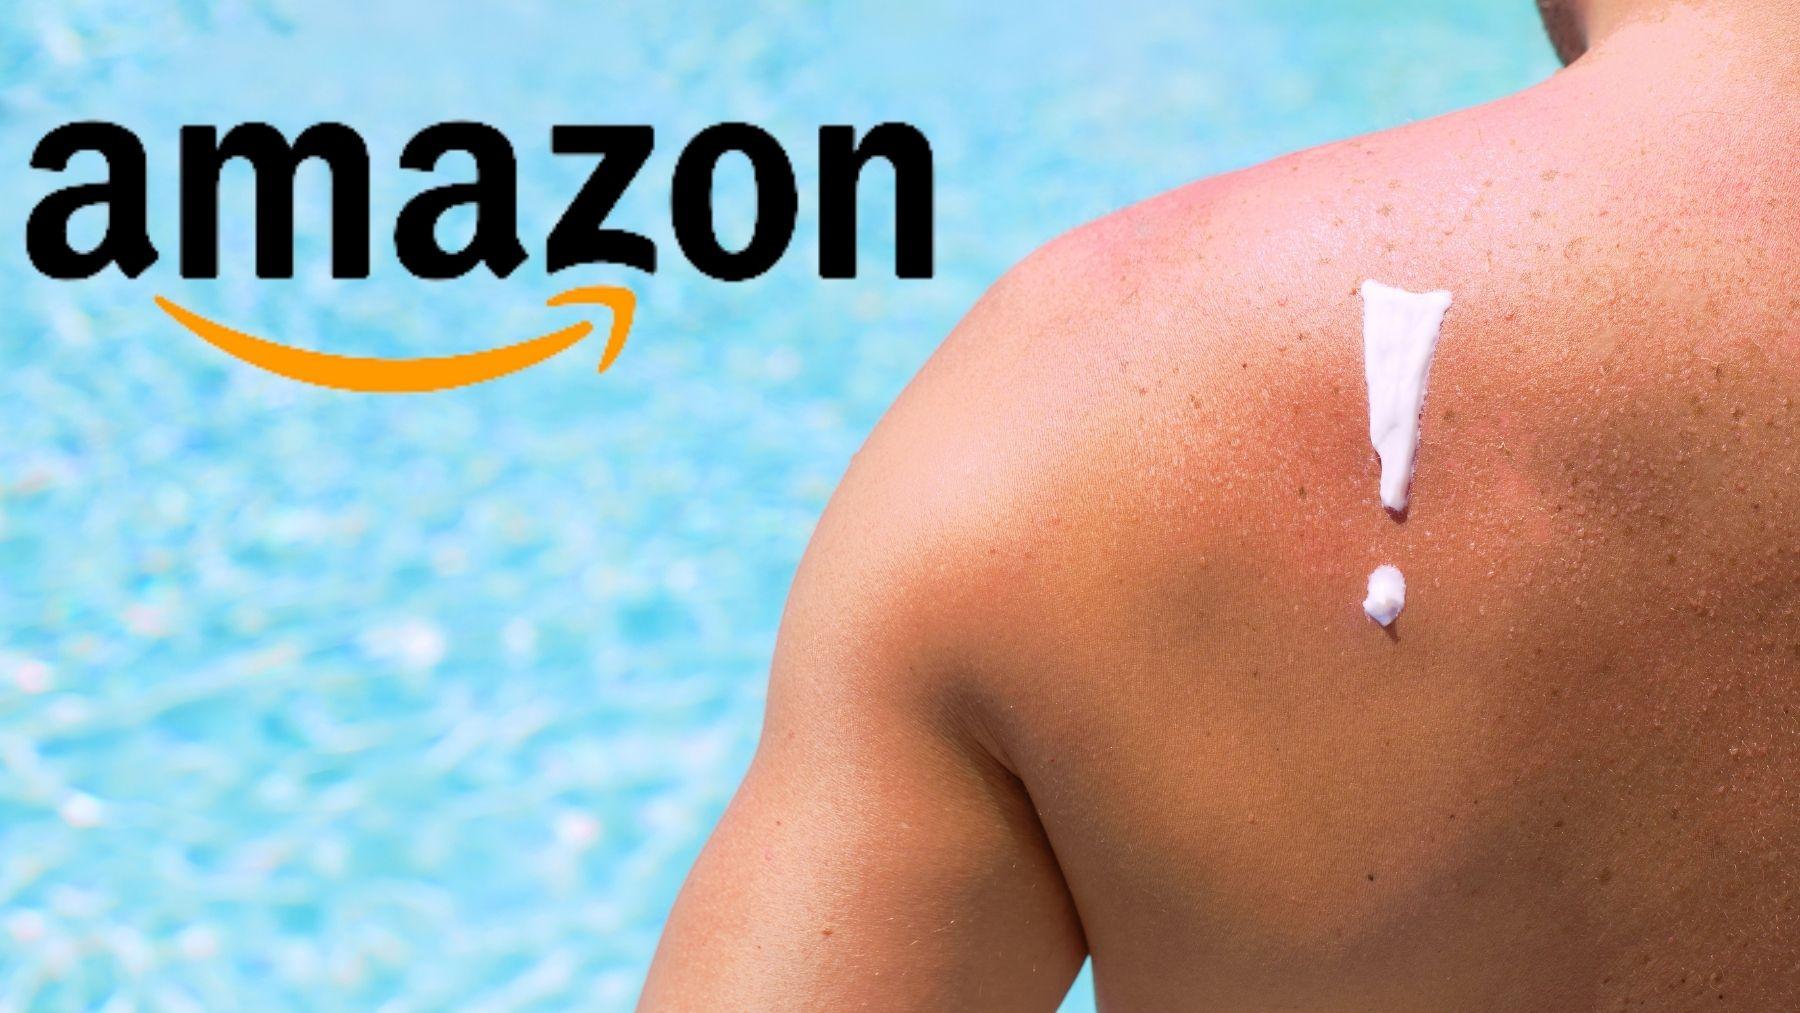 Cremas solares Amazon